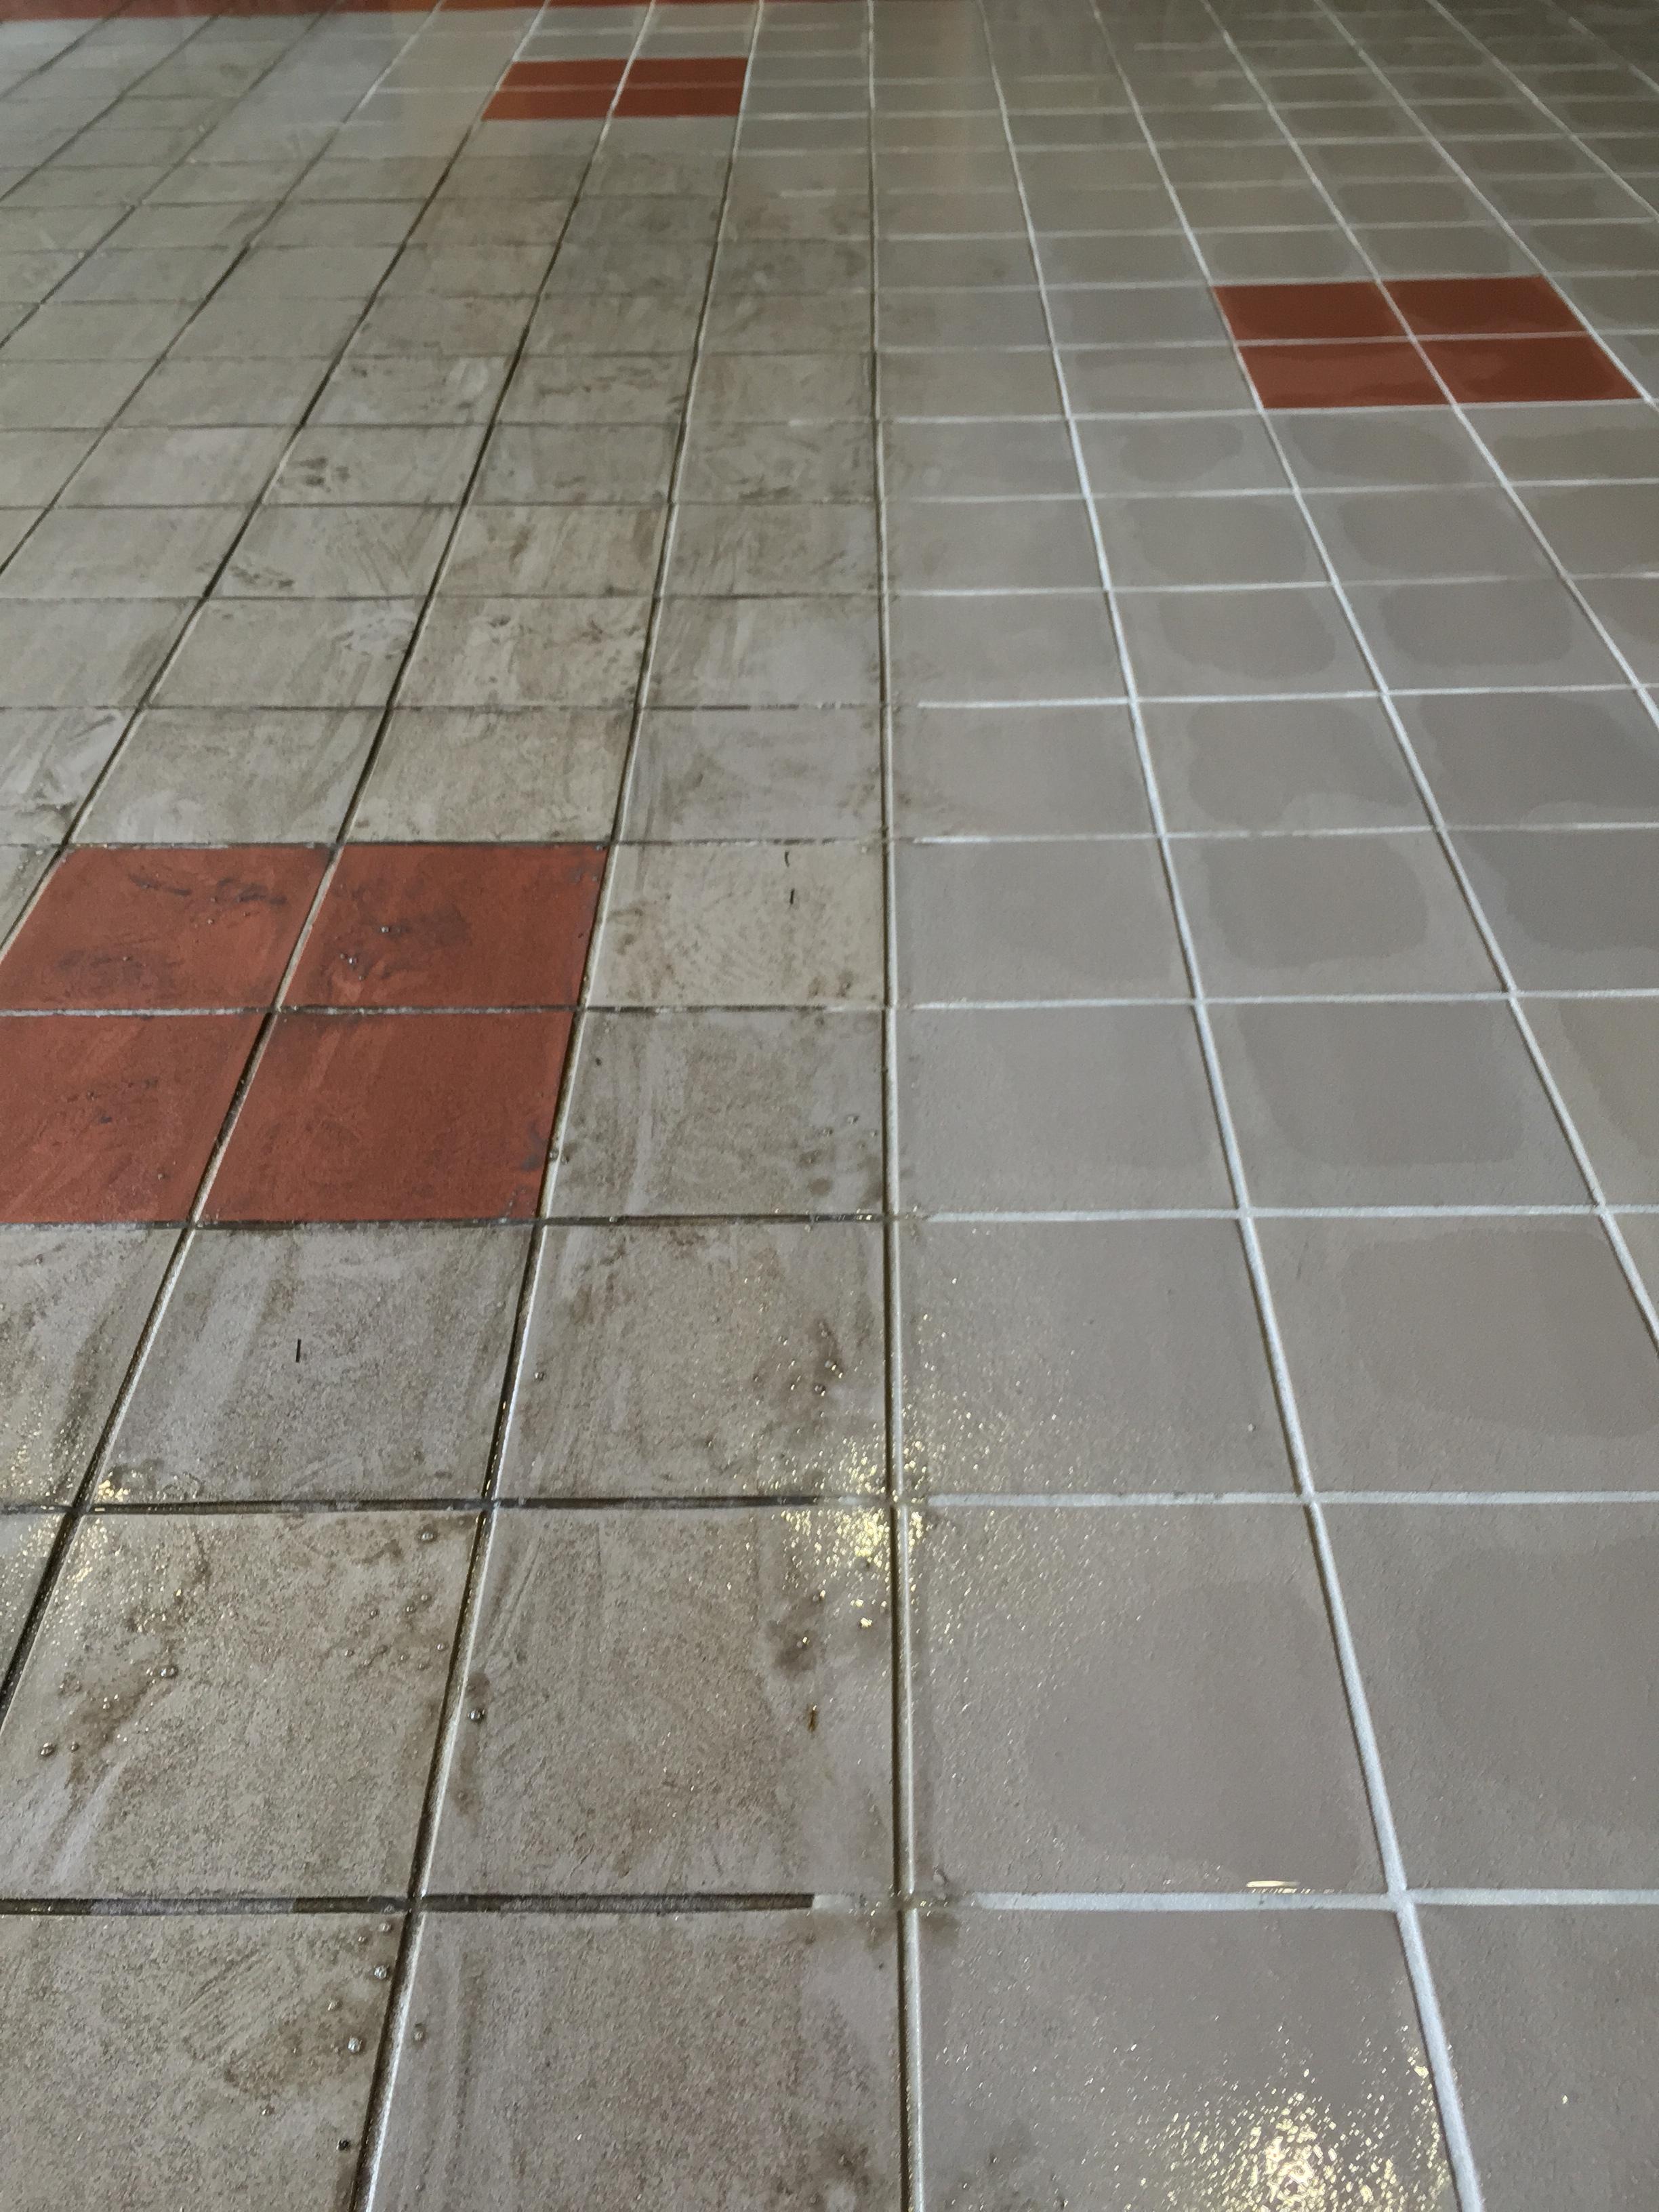 Building entrance floor tile